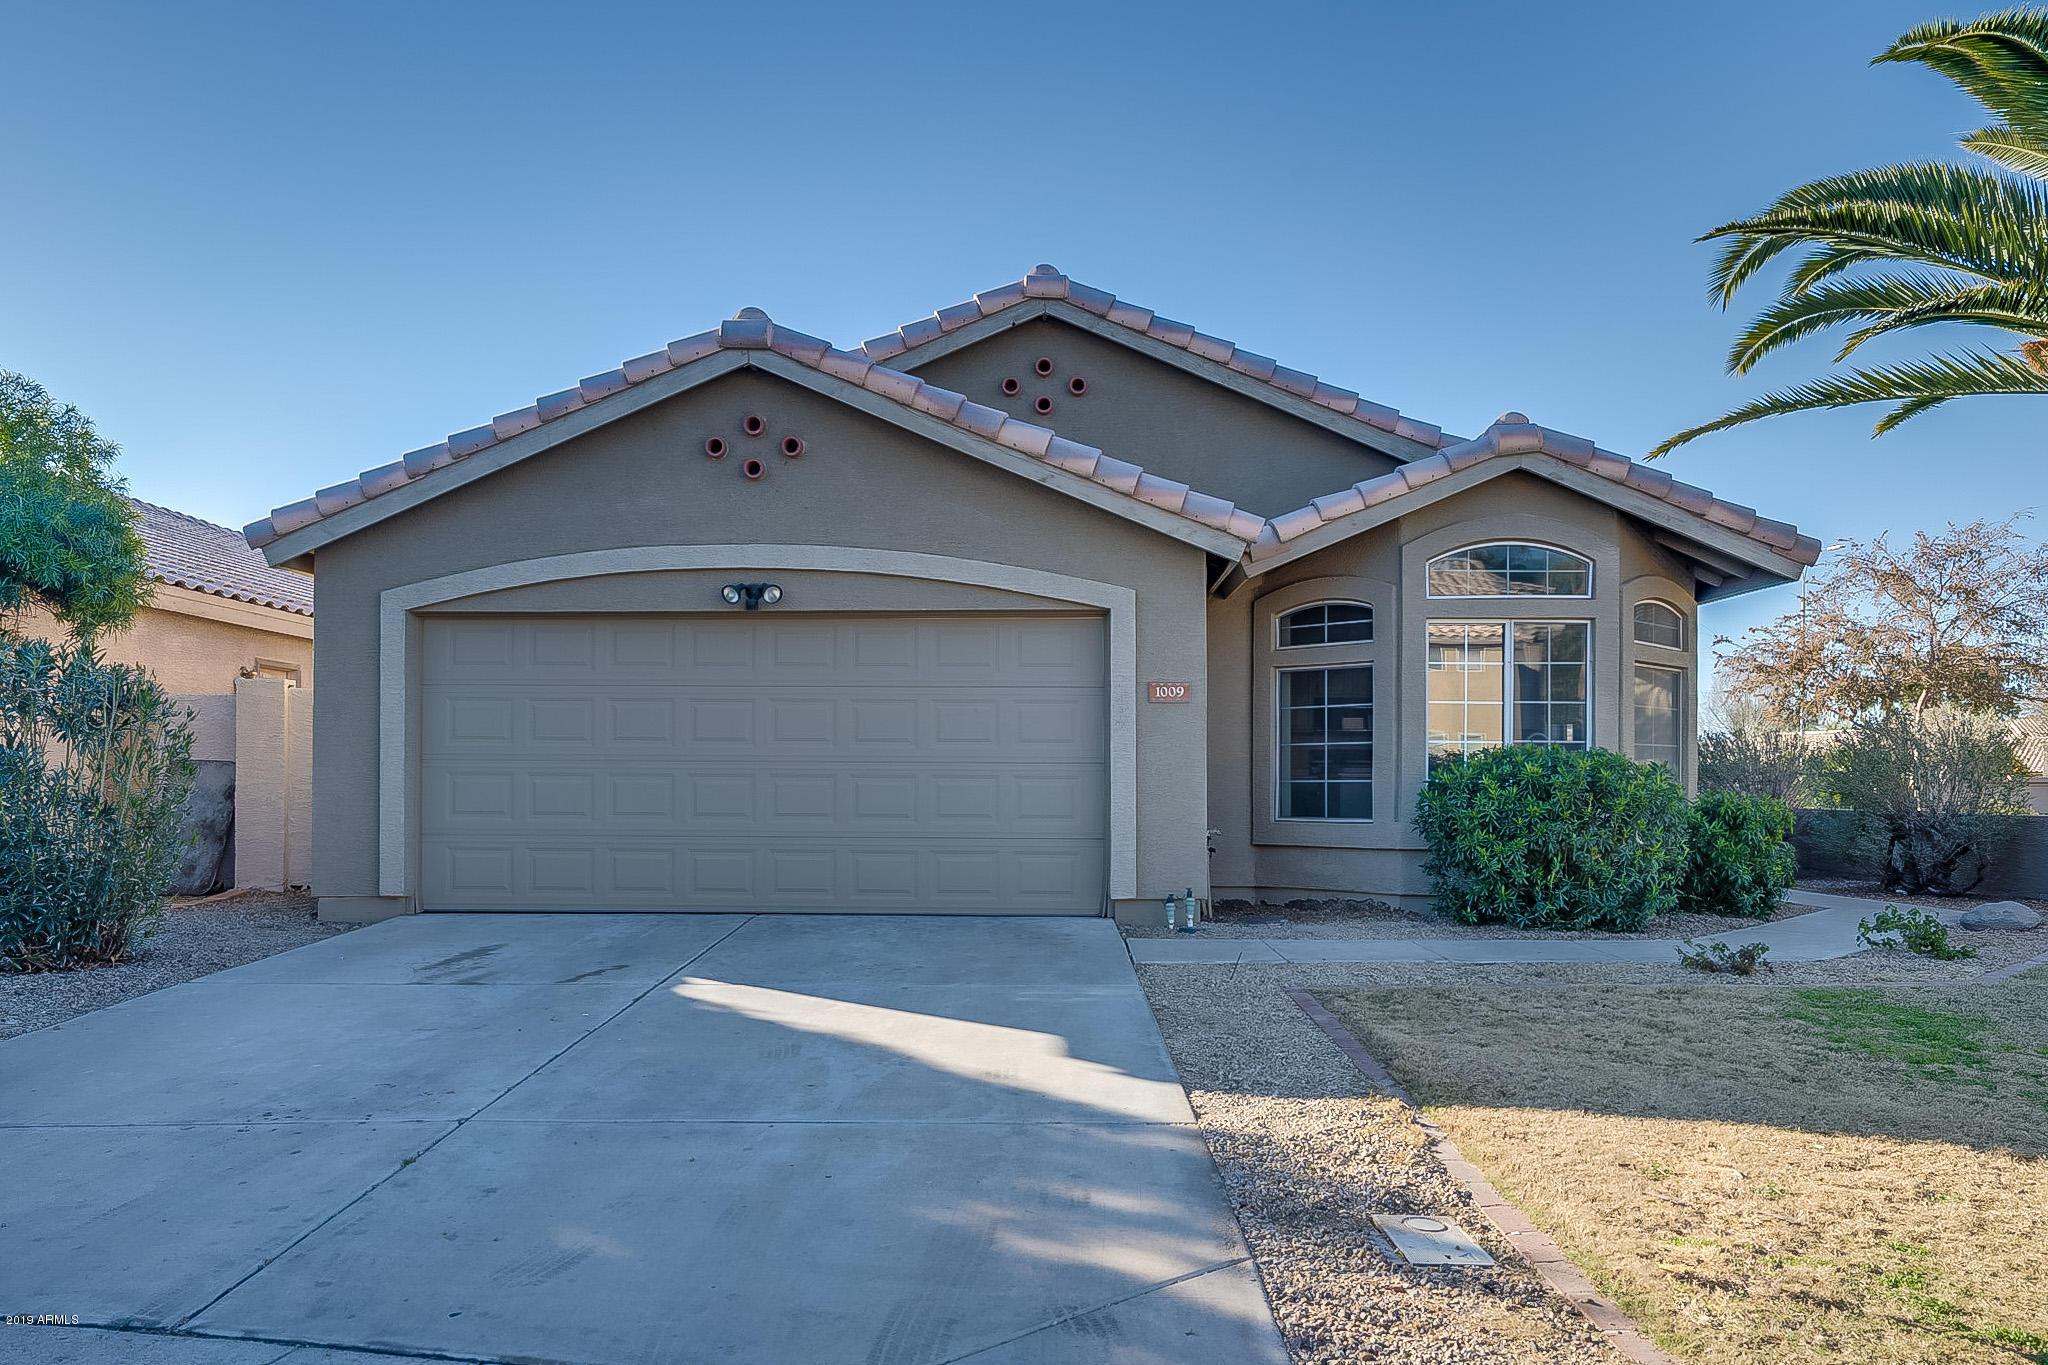 Photo of 1009 N LONGMORE Street, Chandler, AZ 85224